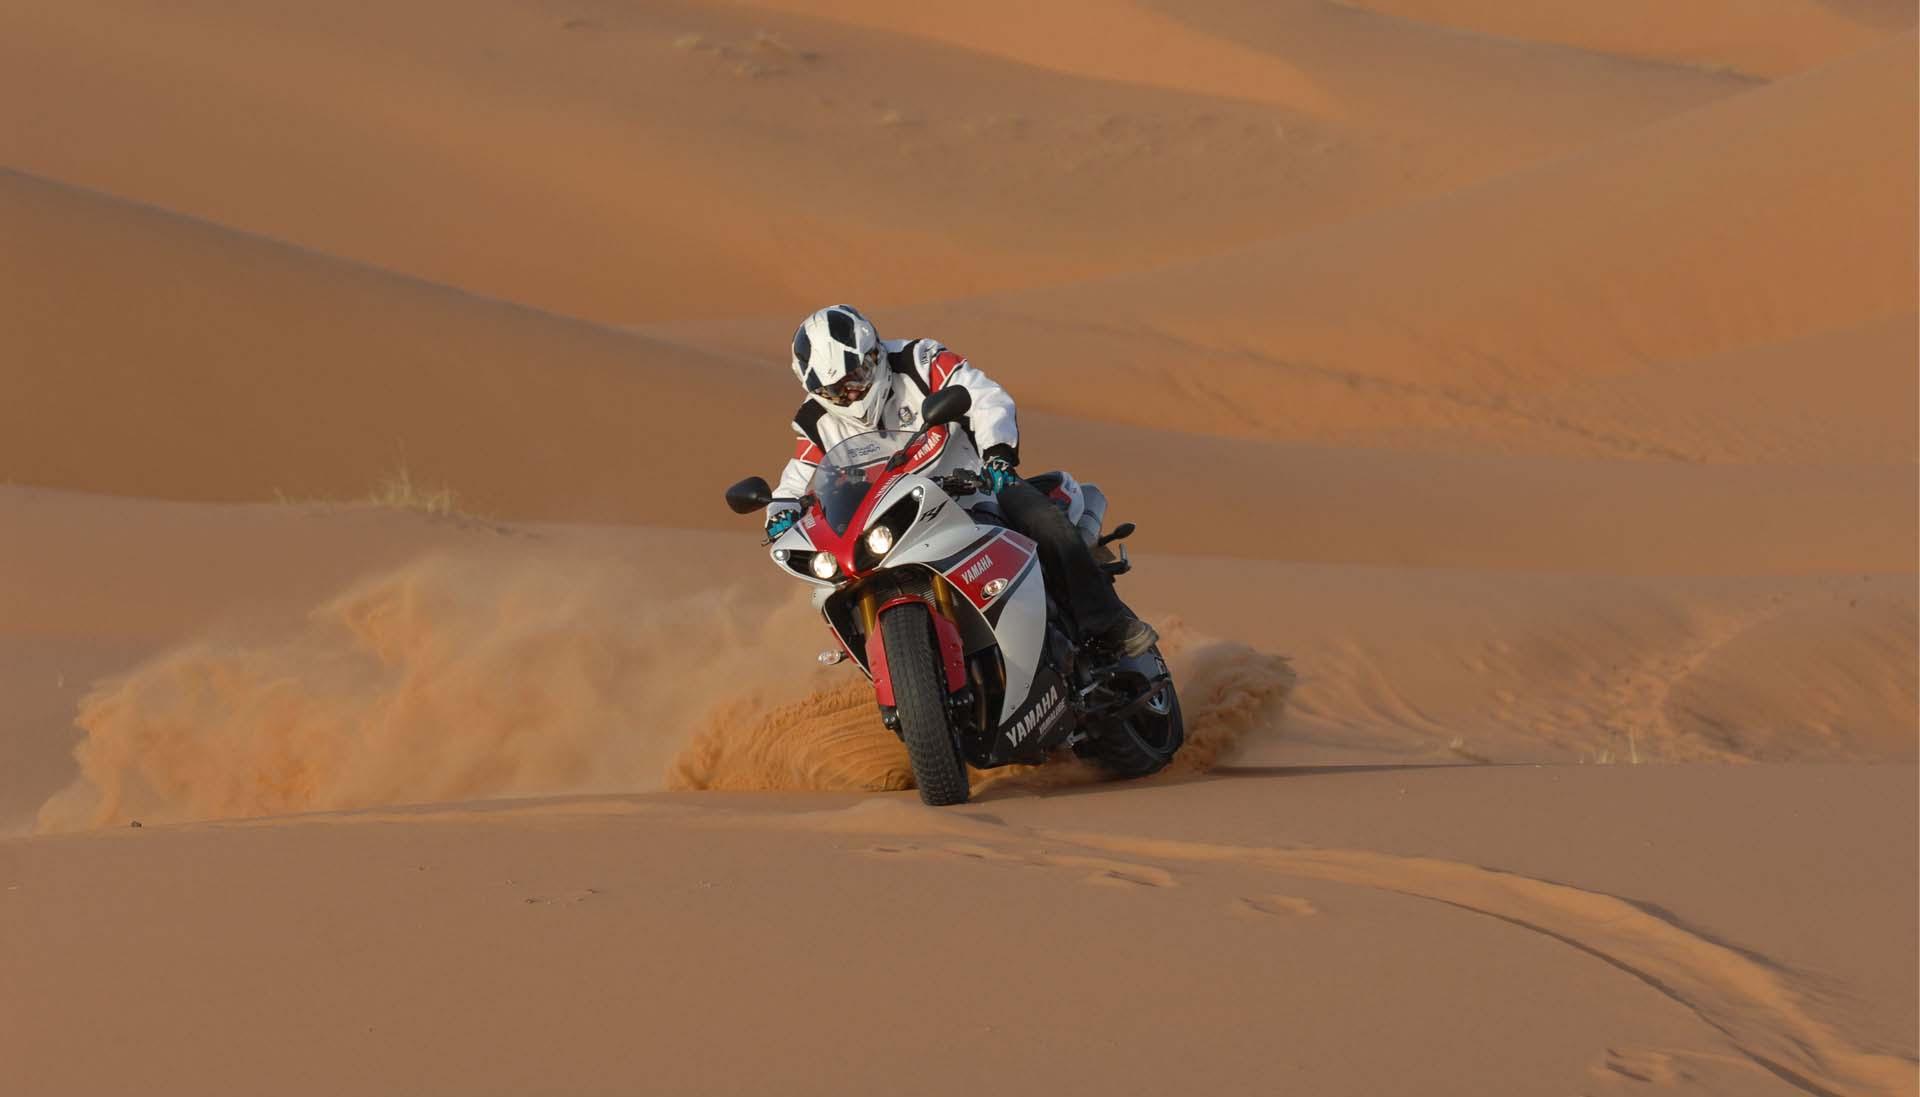 YAMAHA  R1  sobre nieve. Yamaha-YZF-R1-sand-dunes-08